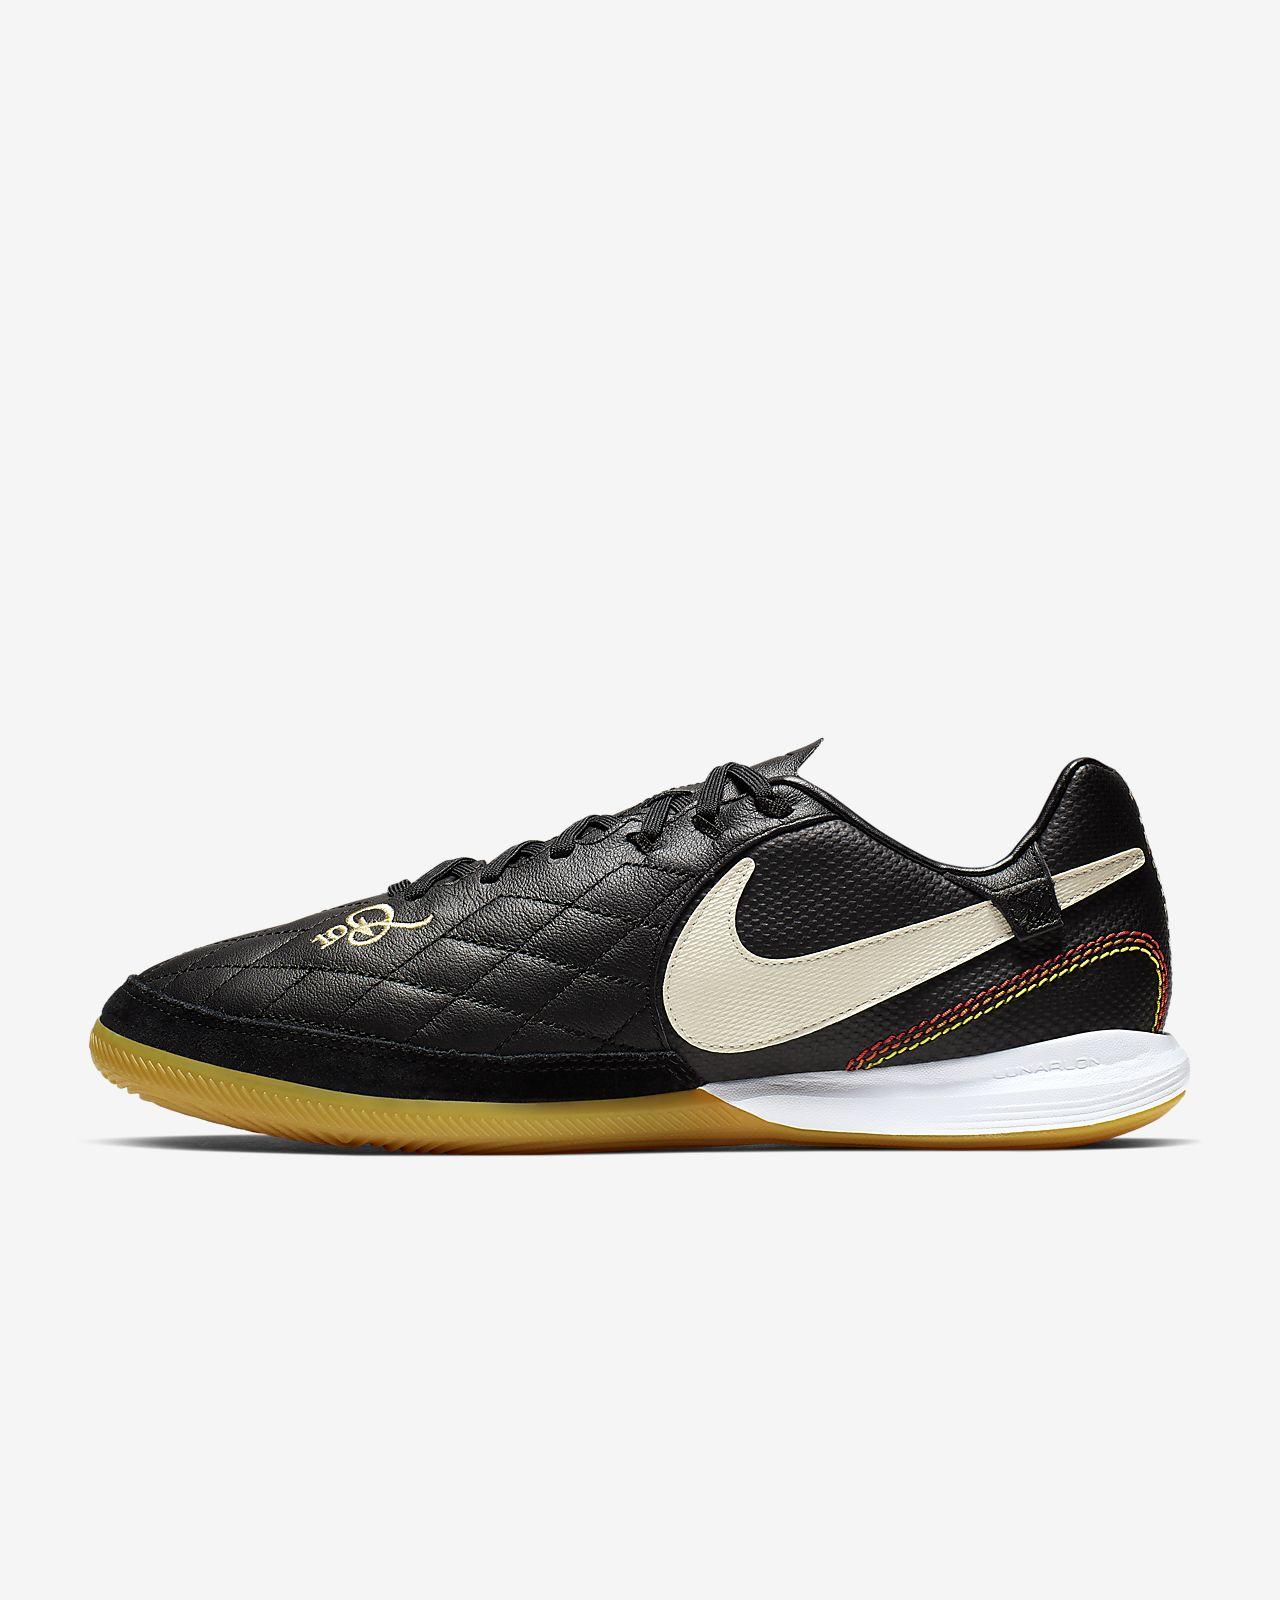 Nike TiempoX Lunar Legend VII Pro 10R teremfutballcipő